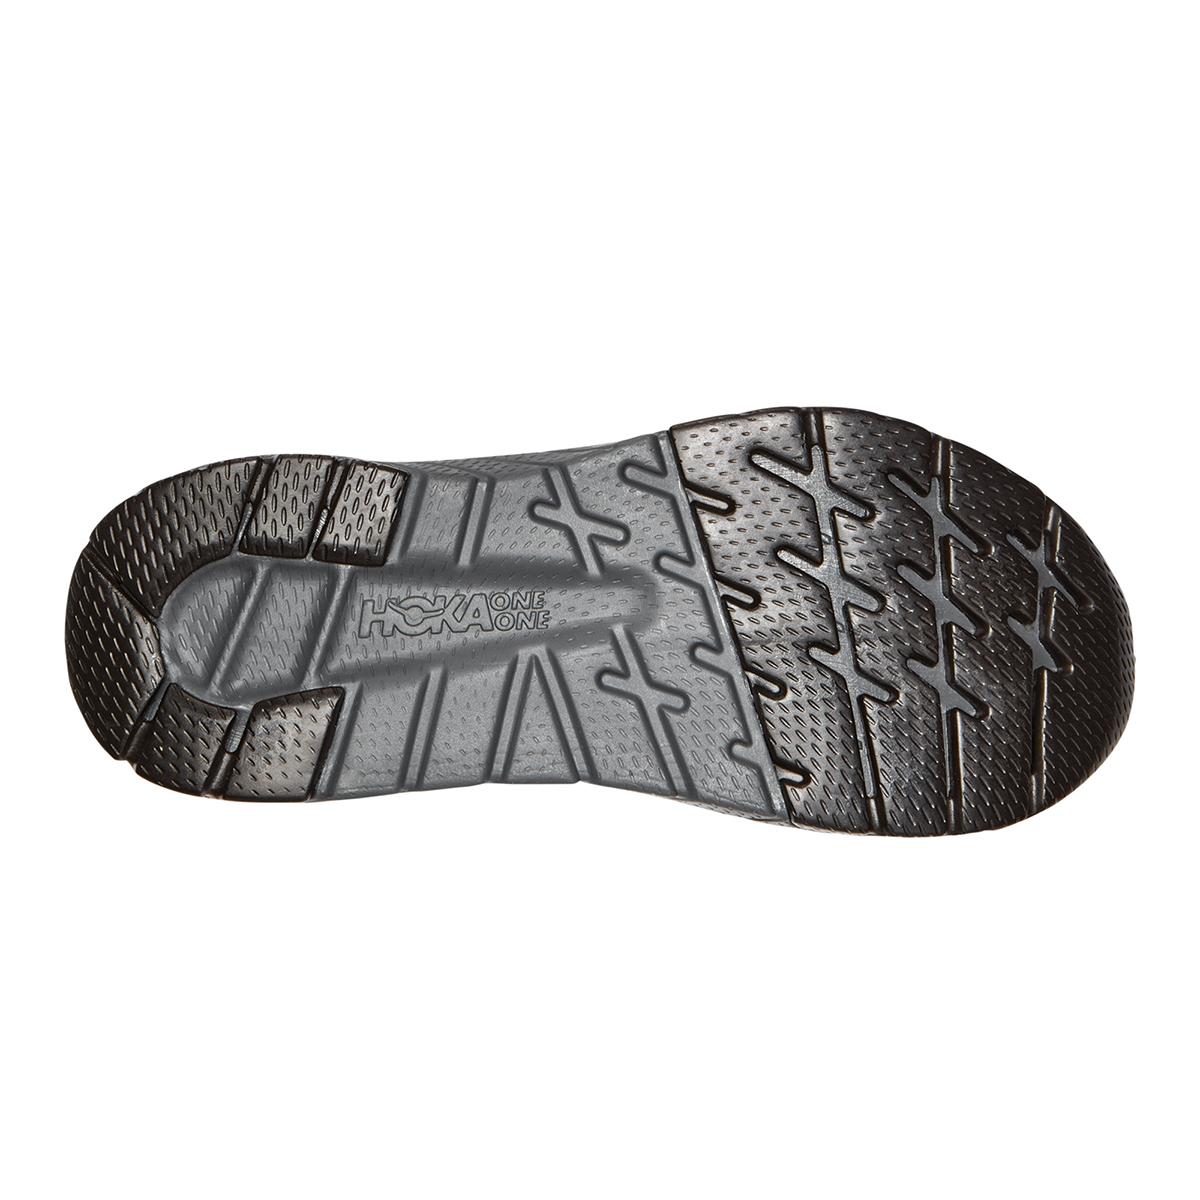 Women's Hoka One One Cavu 3 Slip Running Shoe - Color: Black/Dark Shadow - Size: 5 - Width: Regular, Black/Dark Shadow, large, image 4